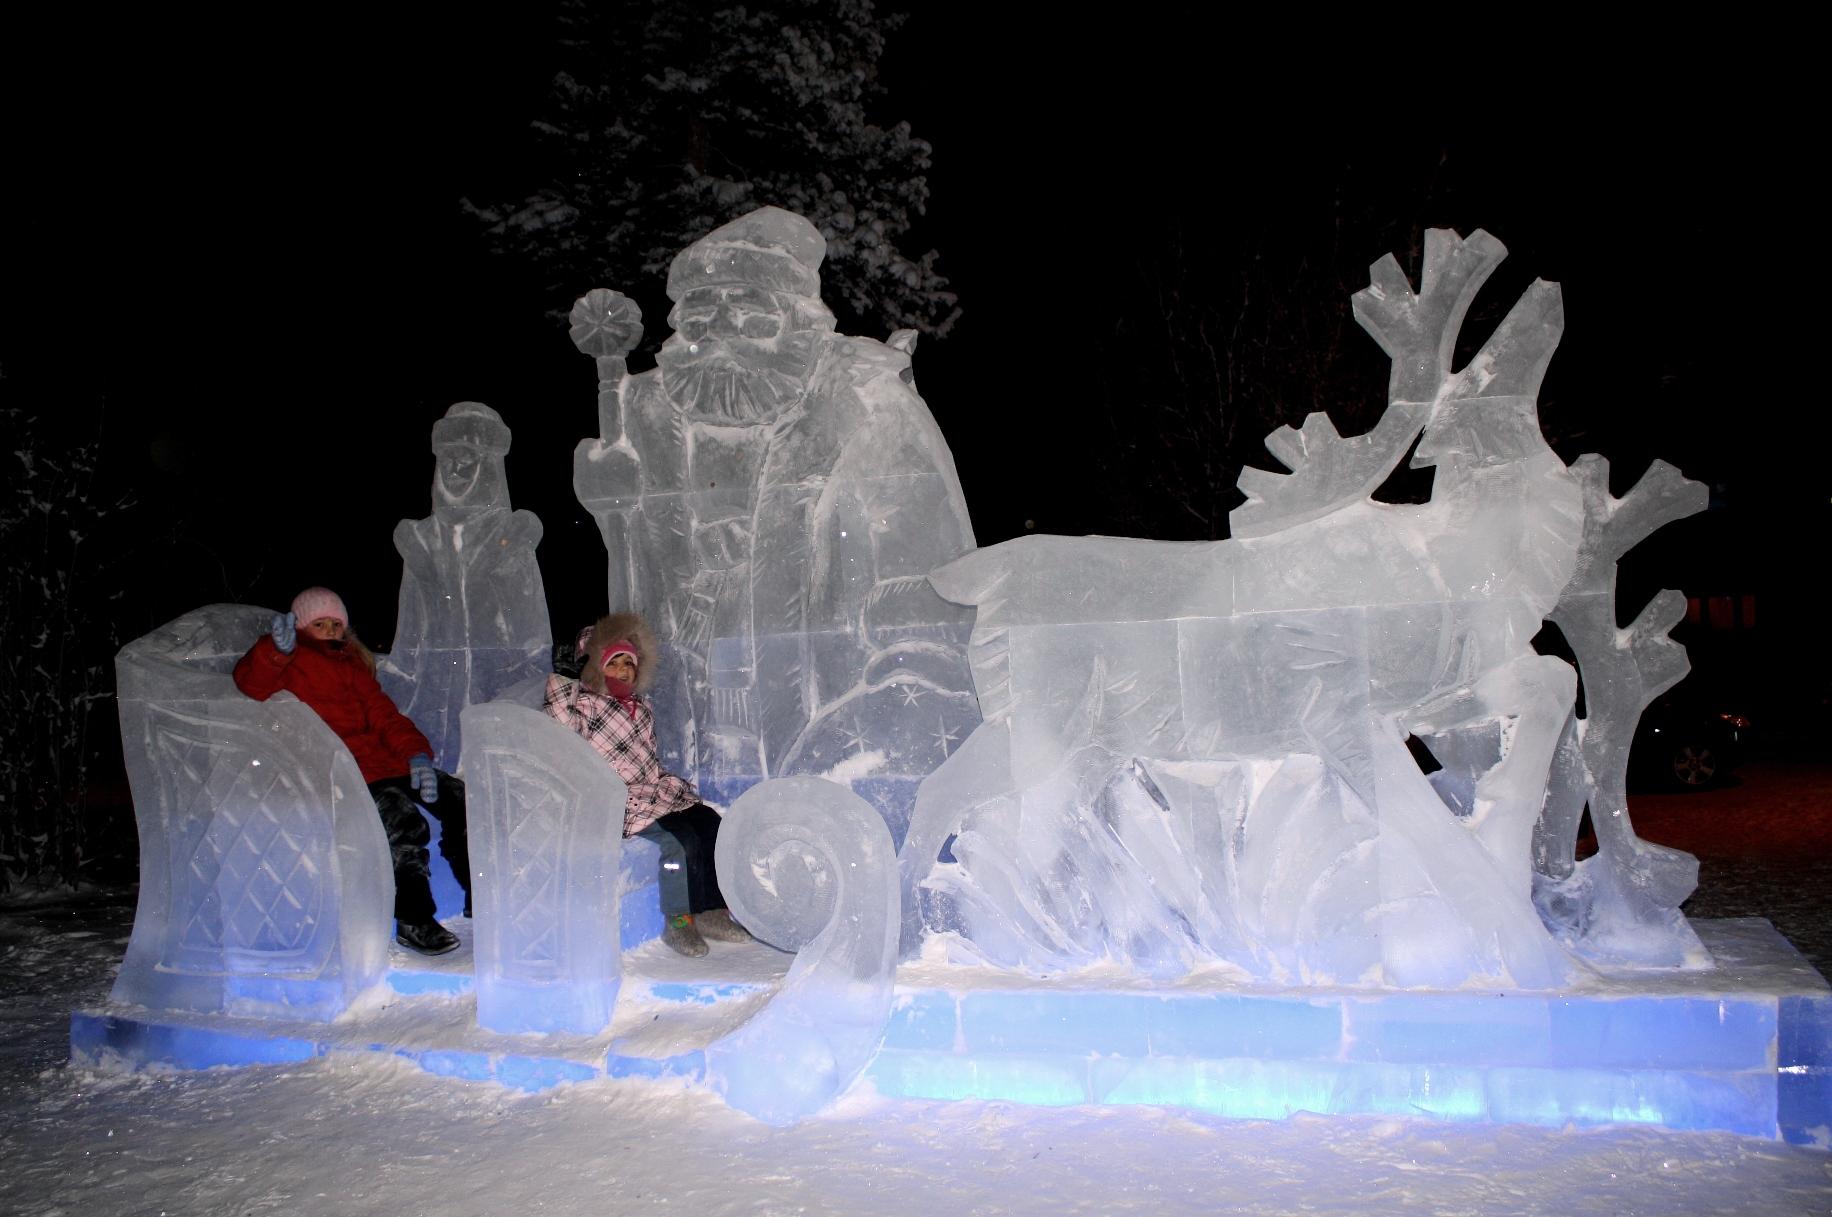 Фигурки из льда картинки того